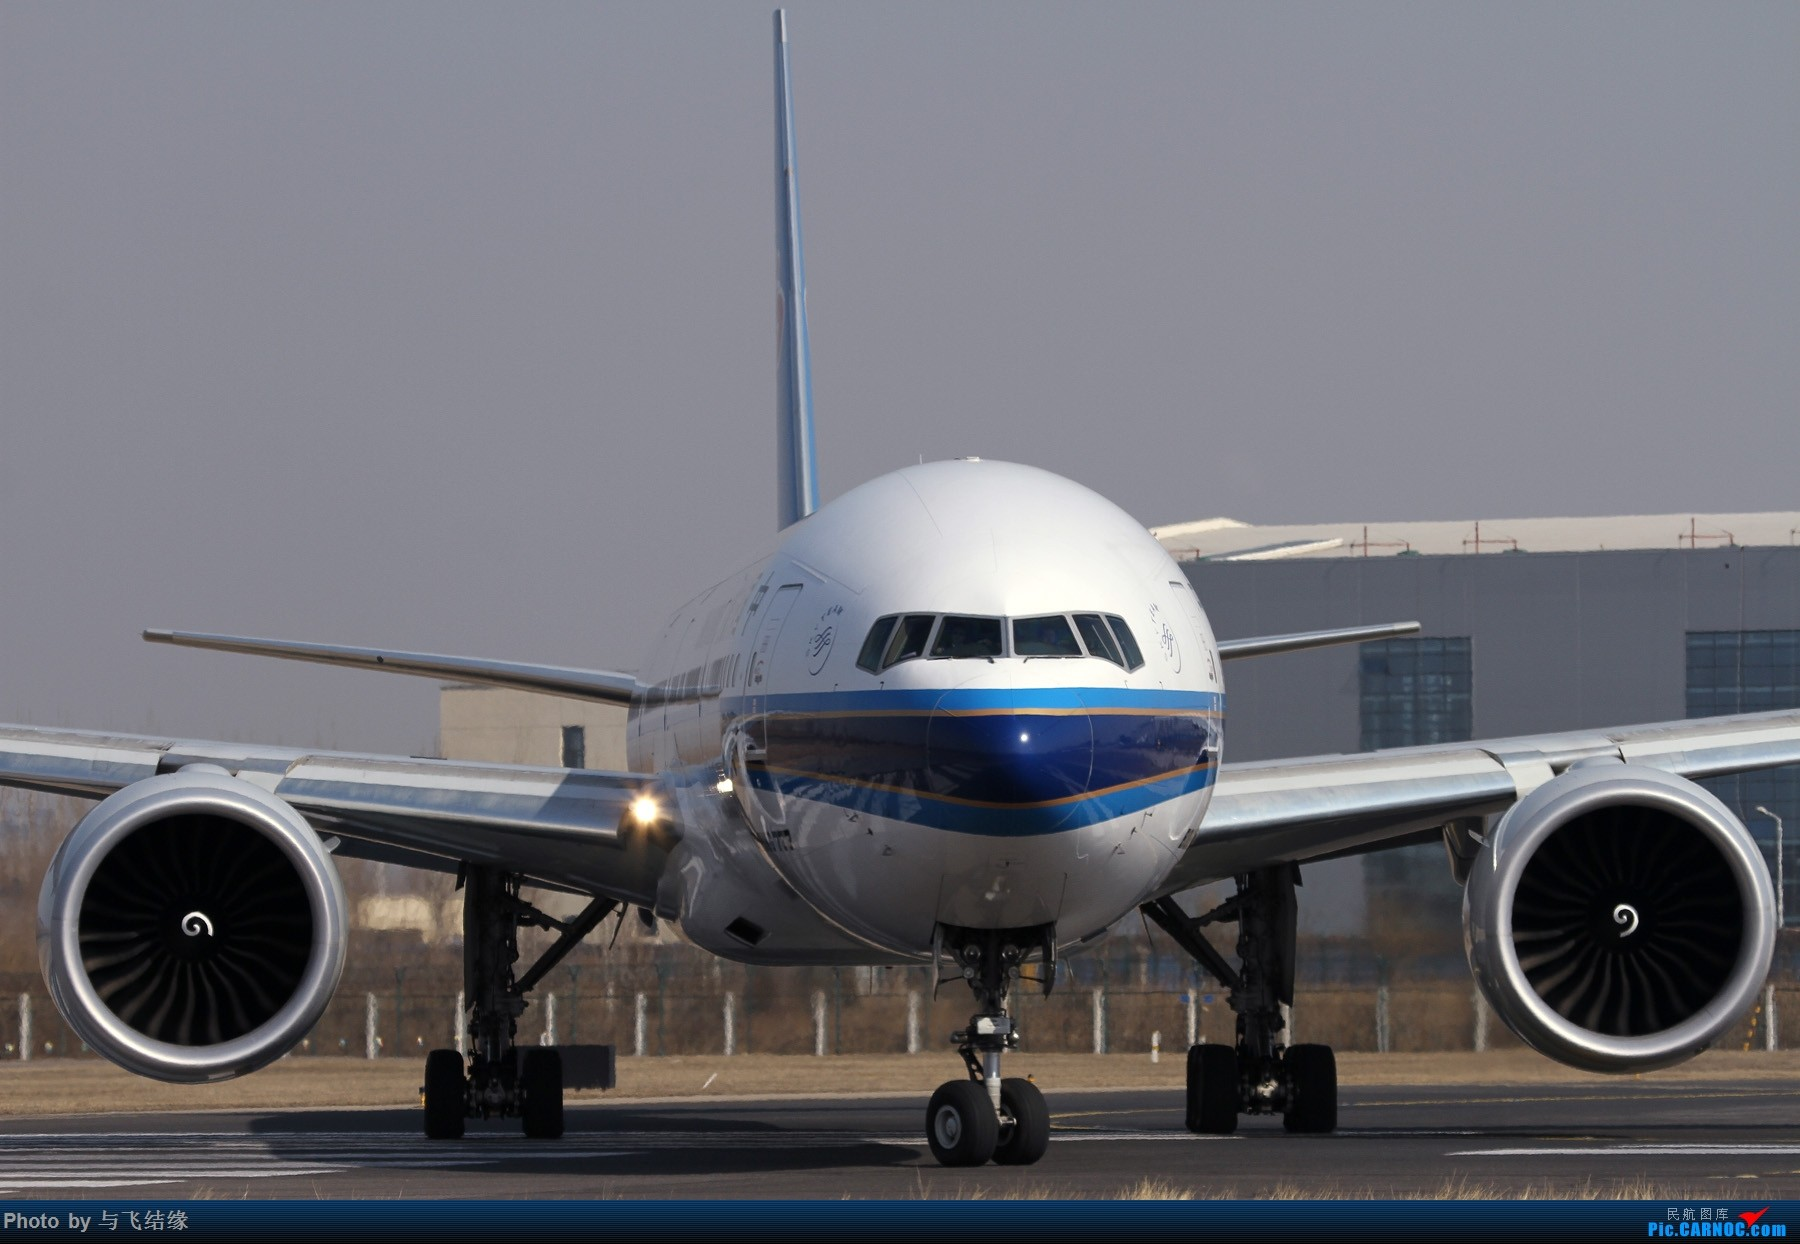 Re:中国南方航空专辑图一组! BOEING 777-300ER B-2007 中国北京首都国际机场